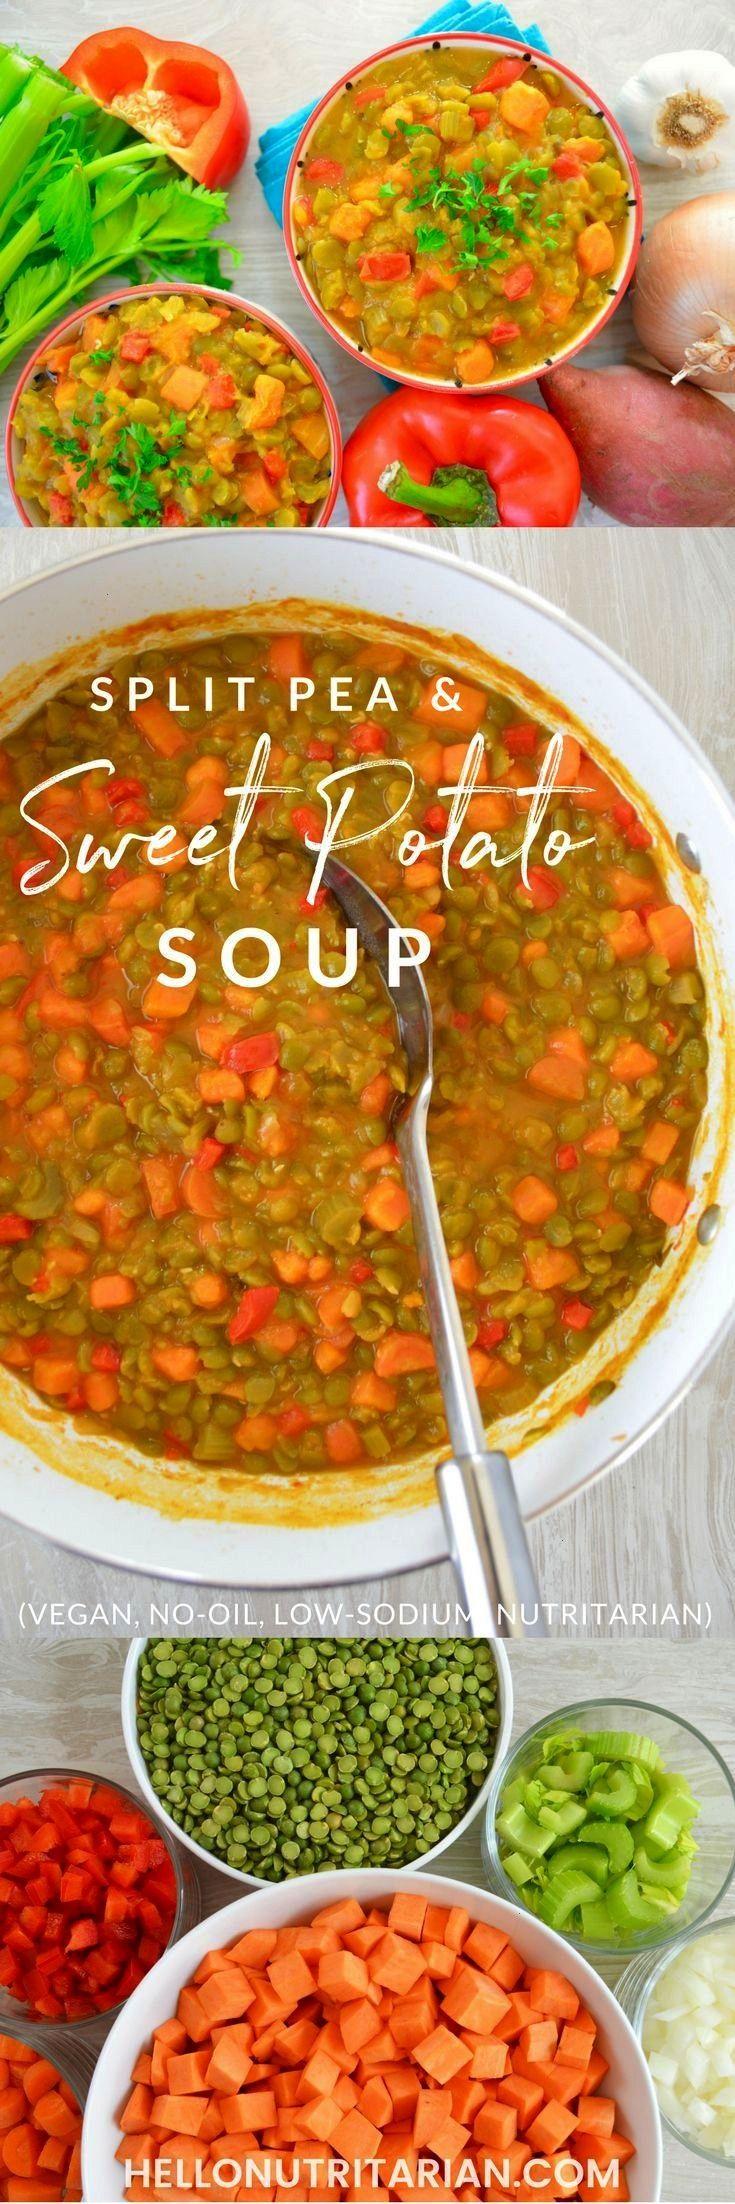 to Live Split Pea  Sweet Potato Soup  Hello Nutritarian  Eat to Live Split Pea  Sweet Potato Soup  Hello Nutritarian   Spinach and mushroom quinoa sauteed in garlic and o...